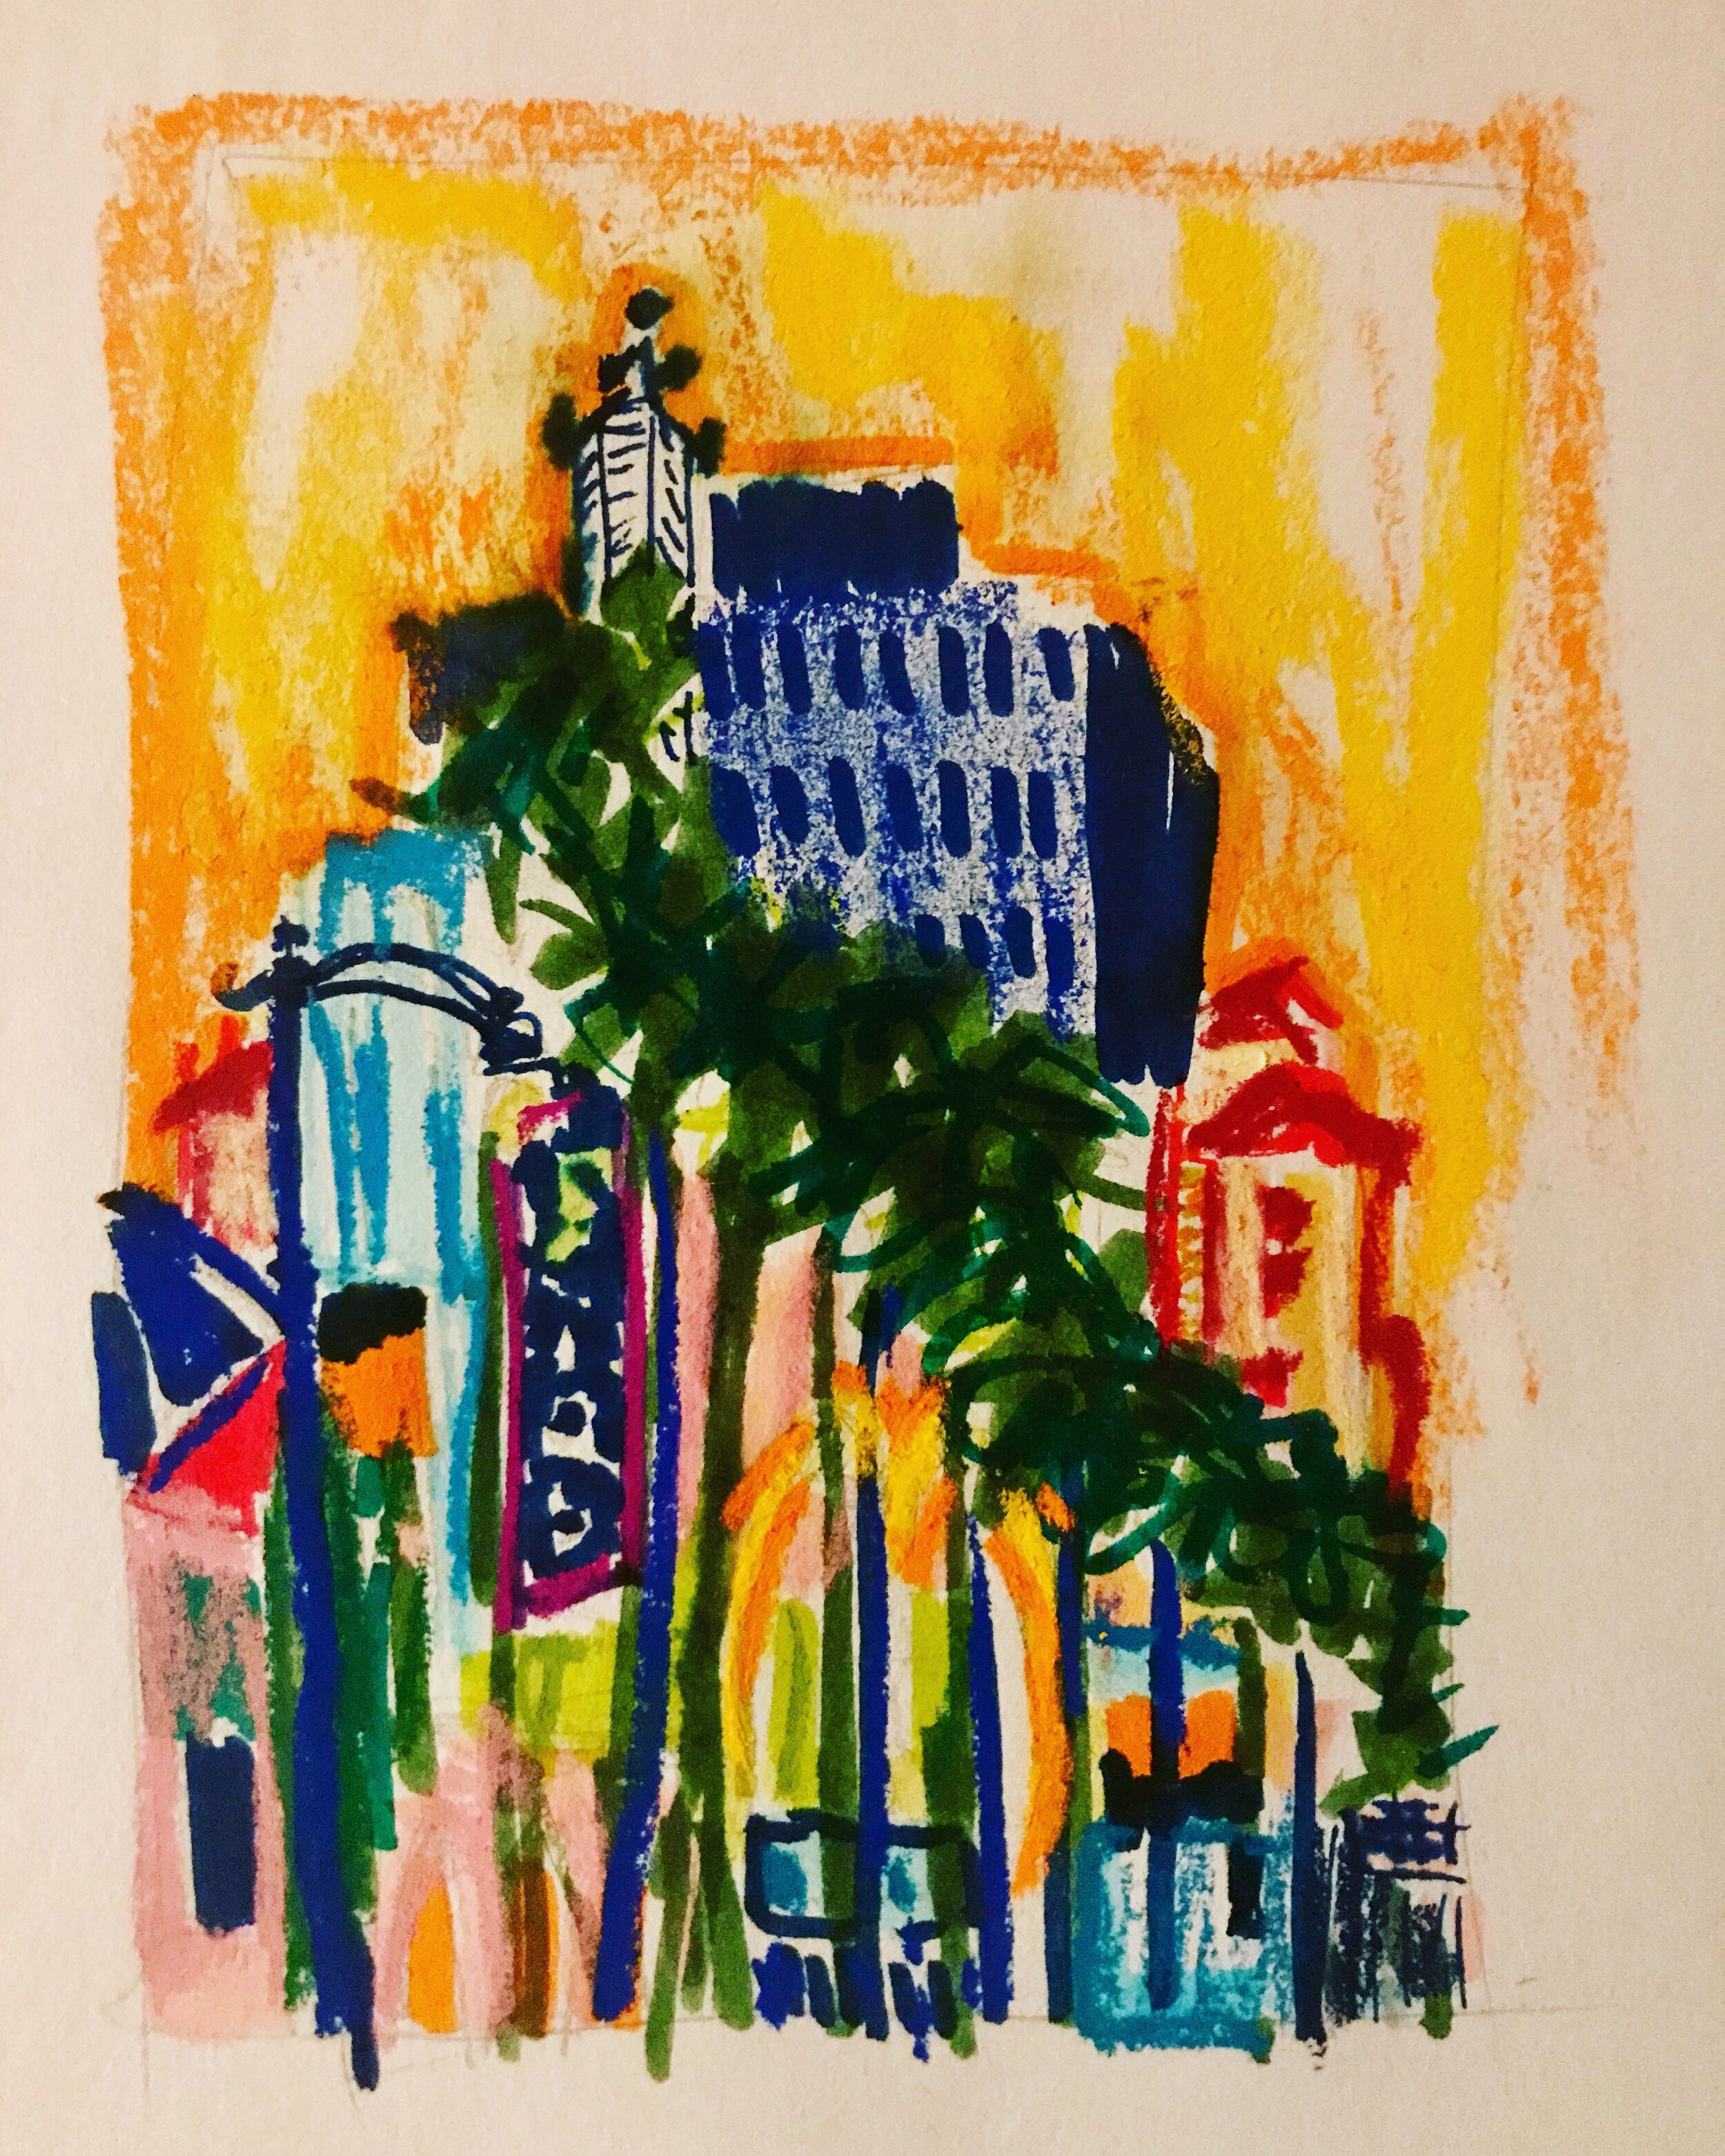 City of Dreams 5x7 Mixed Media on Paper